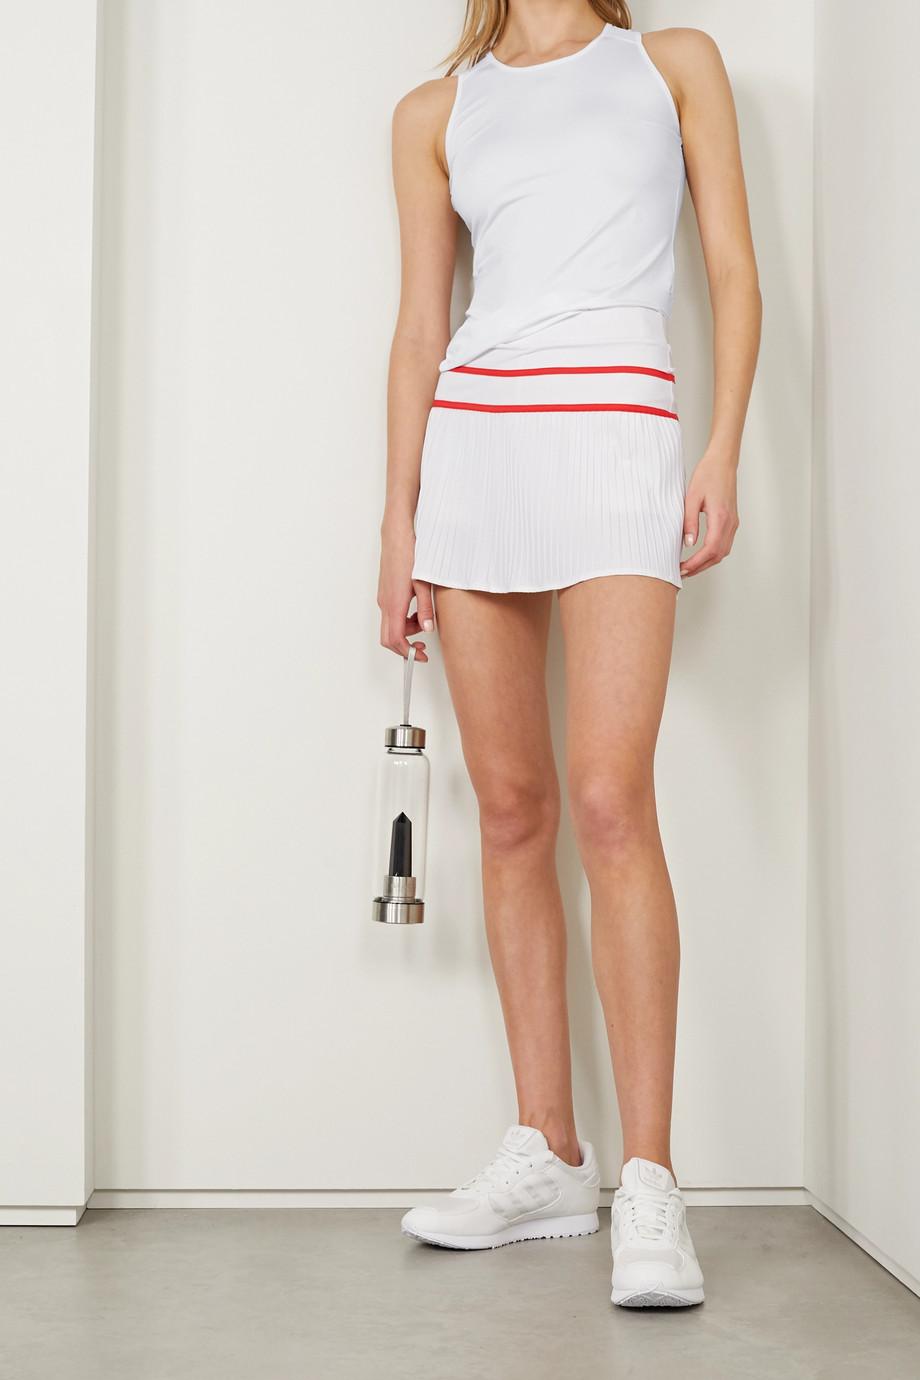 L'Etoile Sport Pleated stretch-jersey tennis skirt